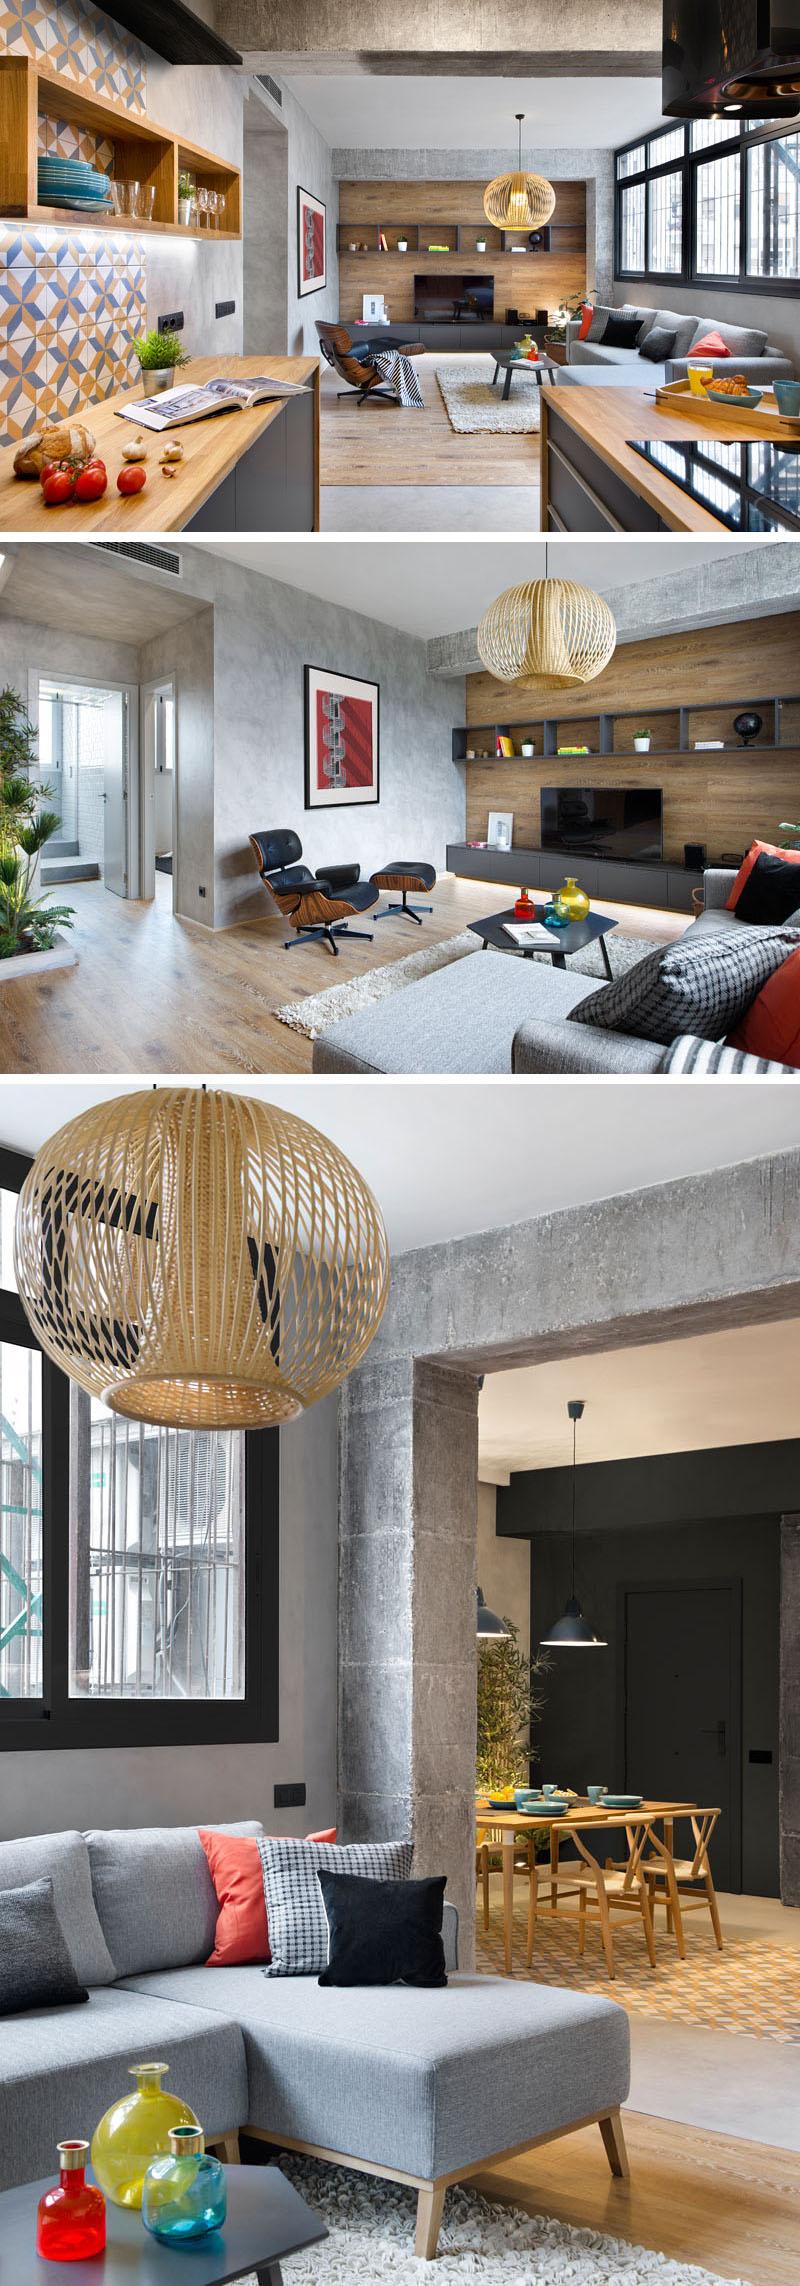 modern-living-room-concrete-wood-210717-112-05.jpg